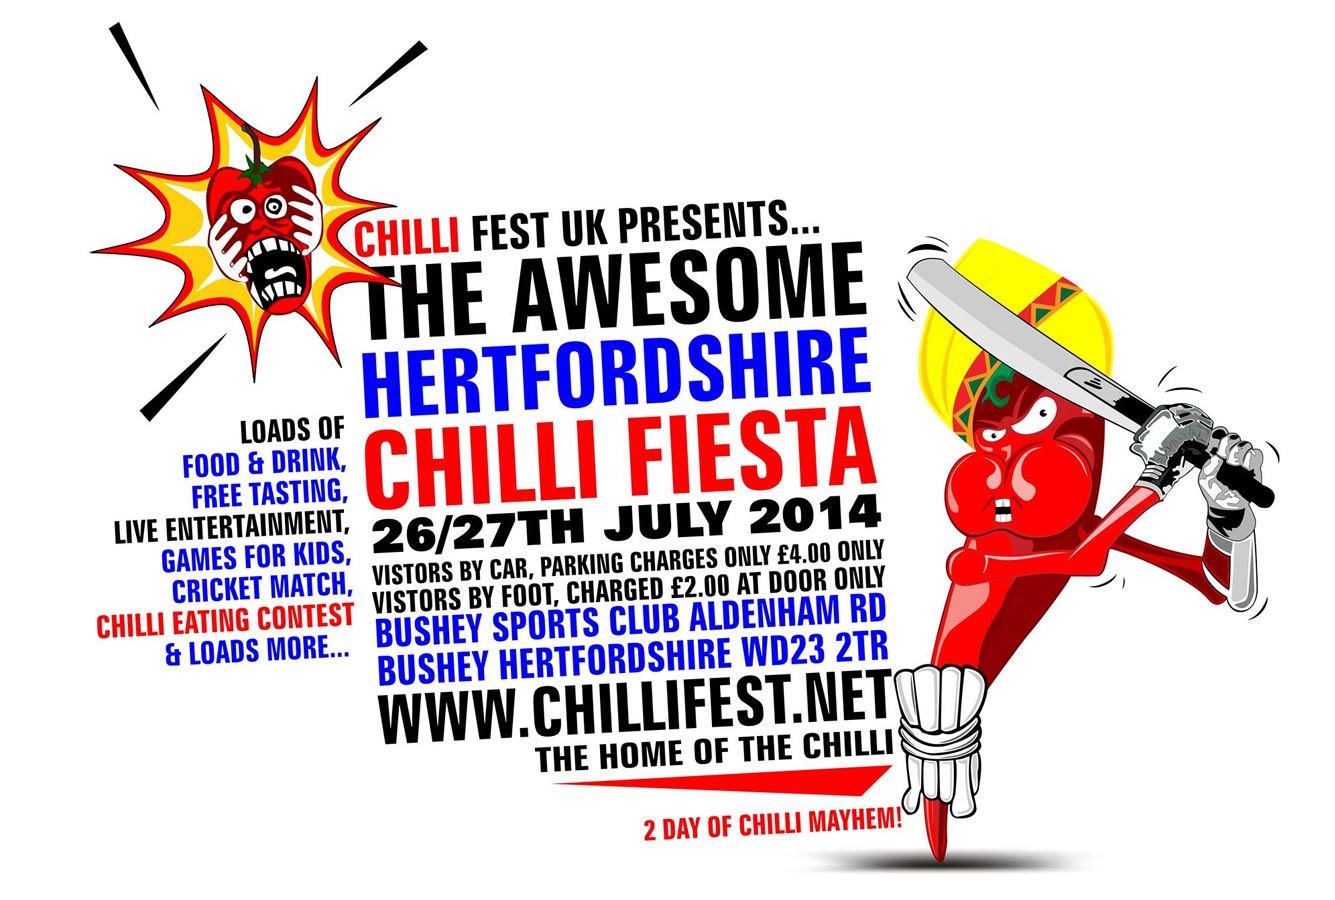 PA Hire for the Chilli Fiesta